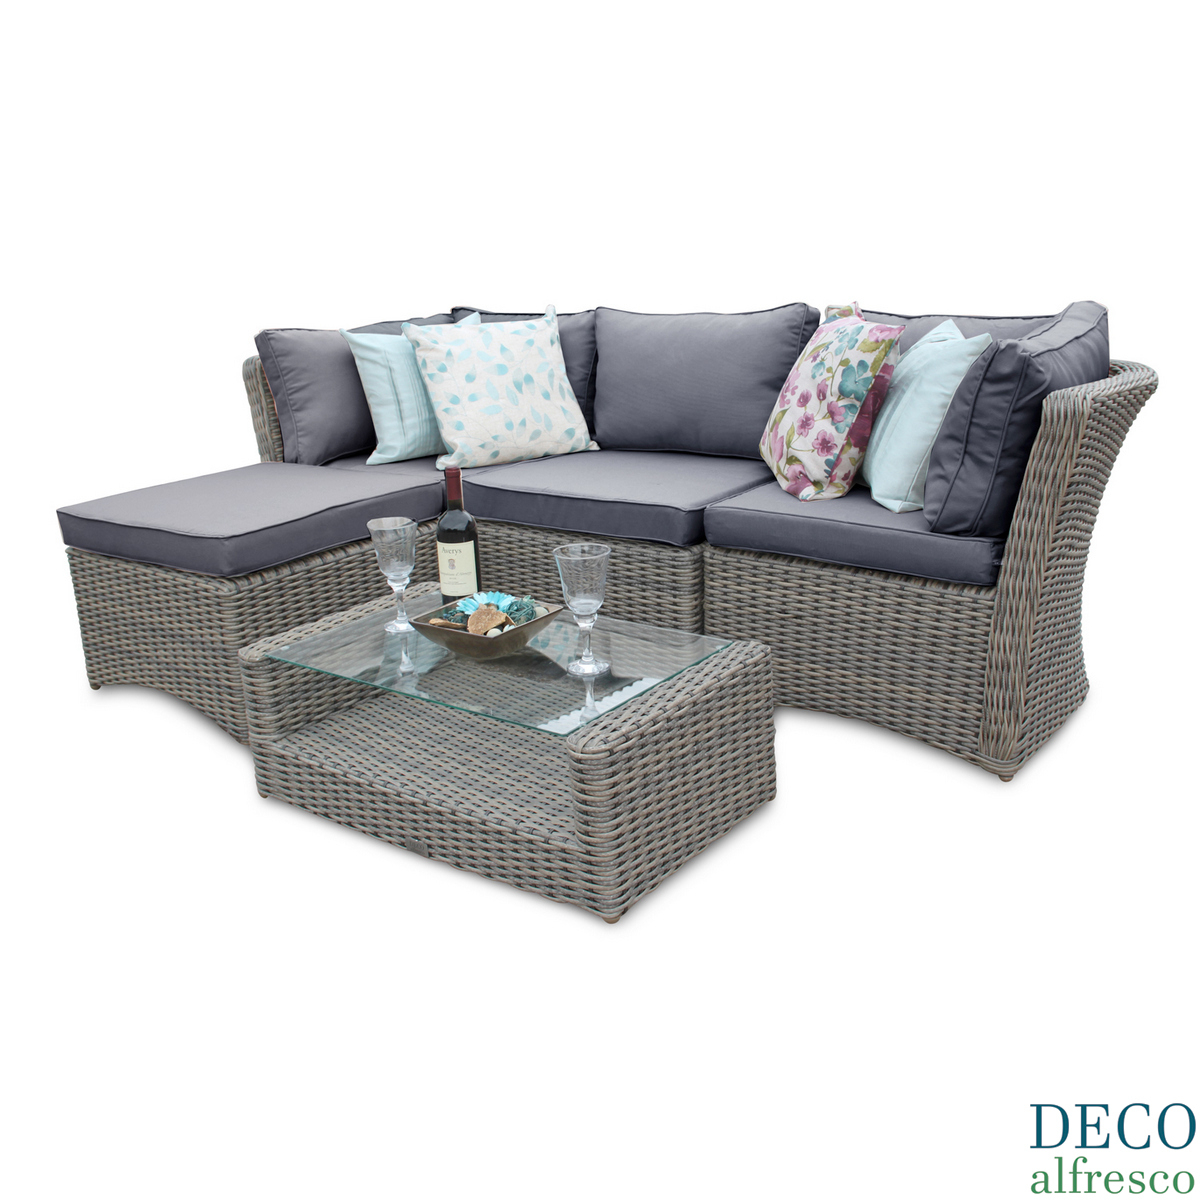 5Pc High Back Modular Corner Rattan Garden Furniture – Deco Alfresco With Regard To London Dark Grey Sofa Chairs (View 13 of 20)